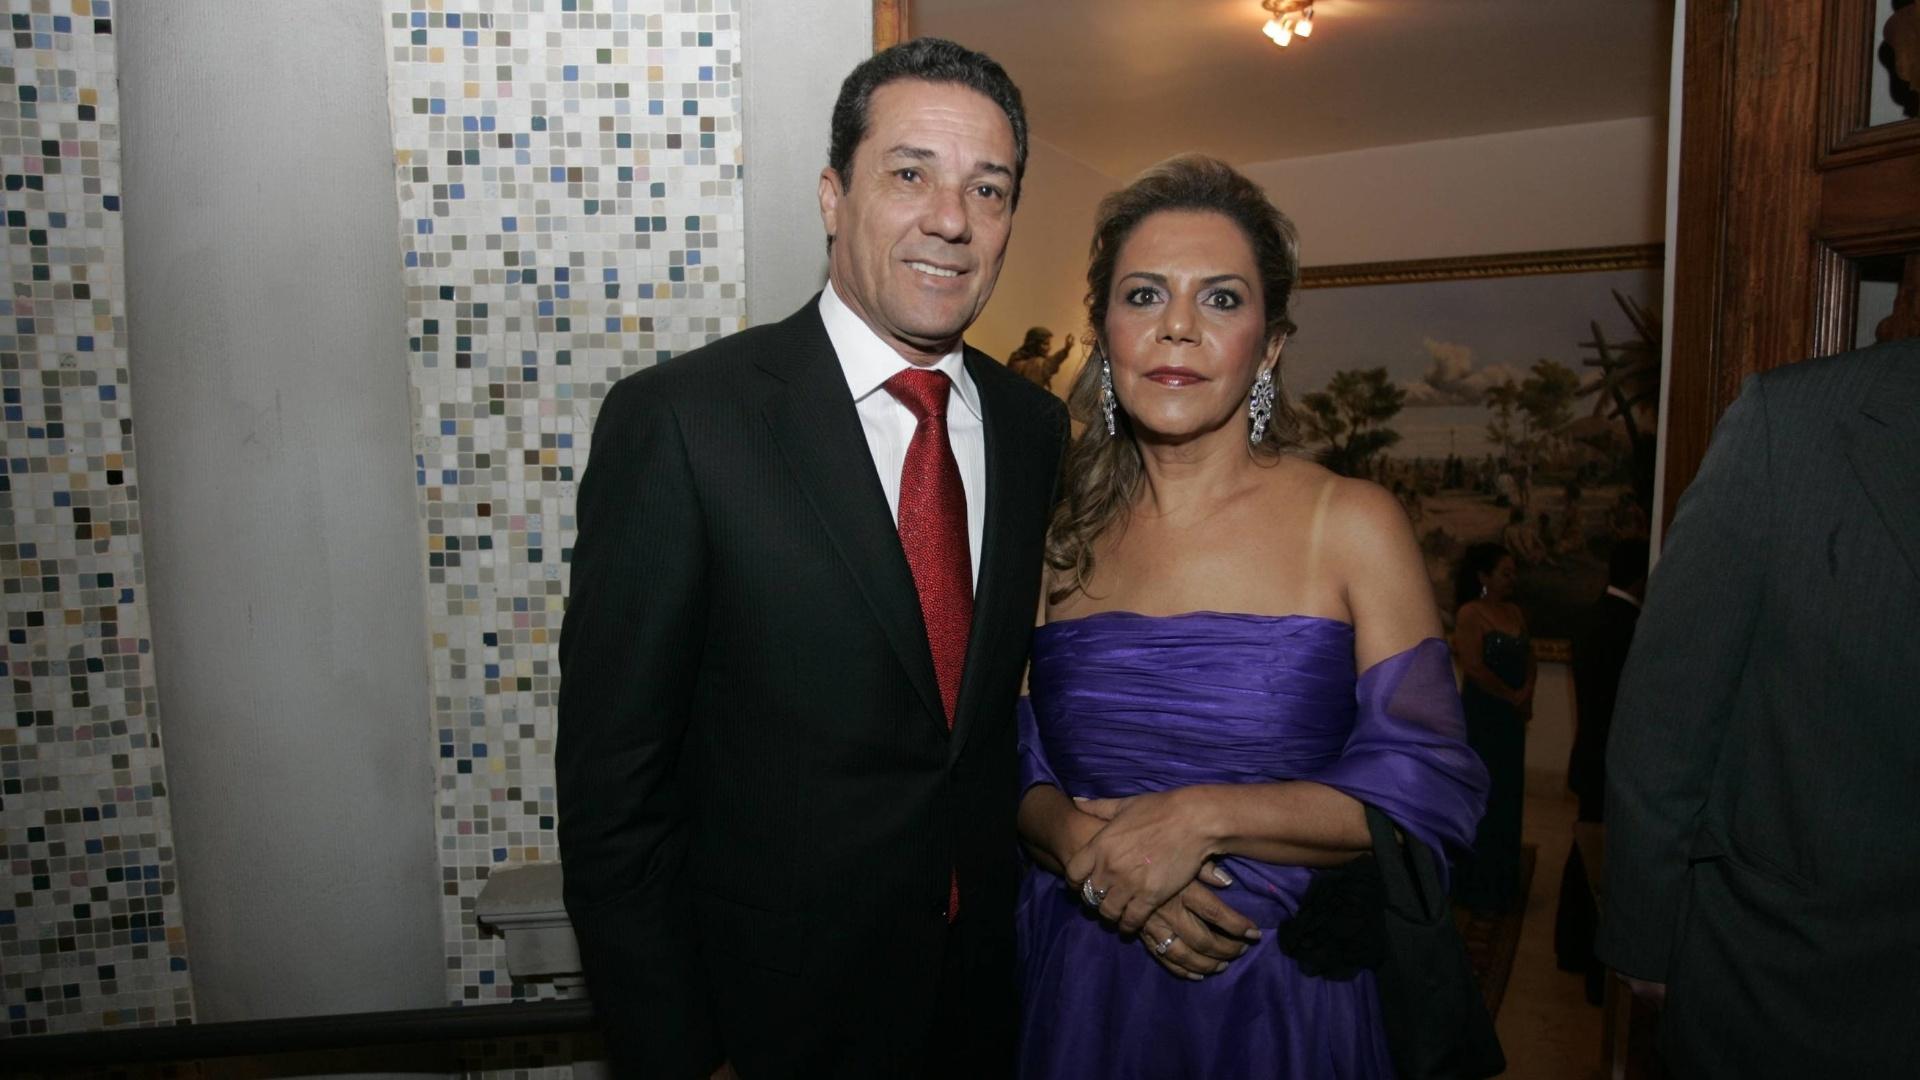 Vanderlei Luxemburgo e Jô, sua mulher